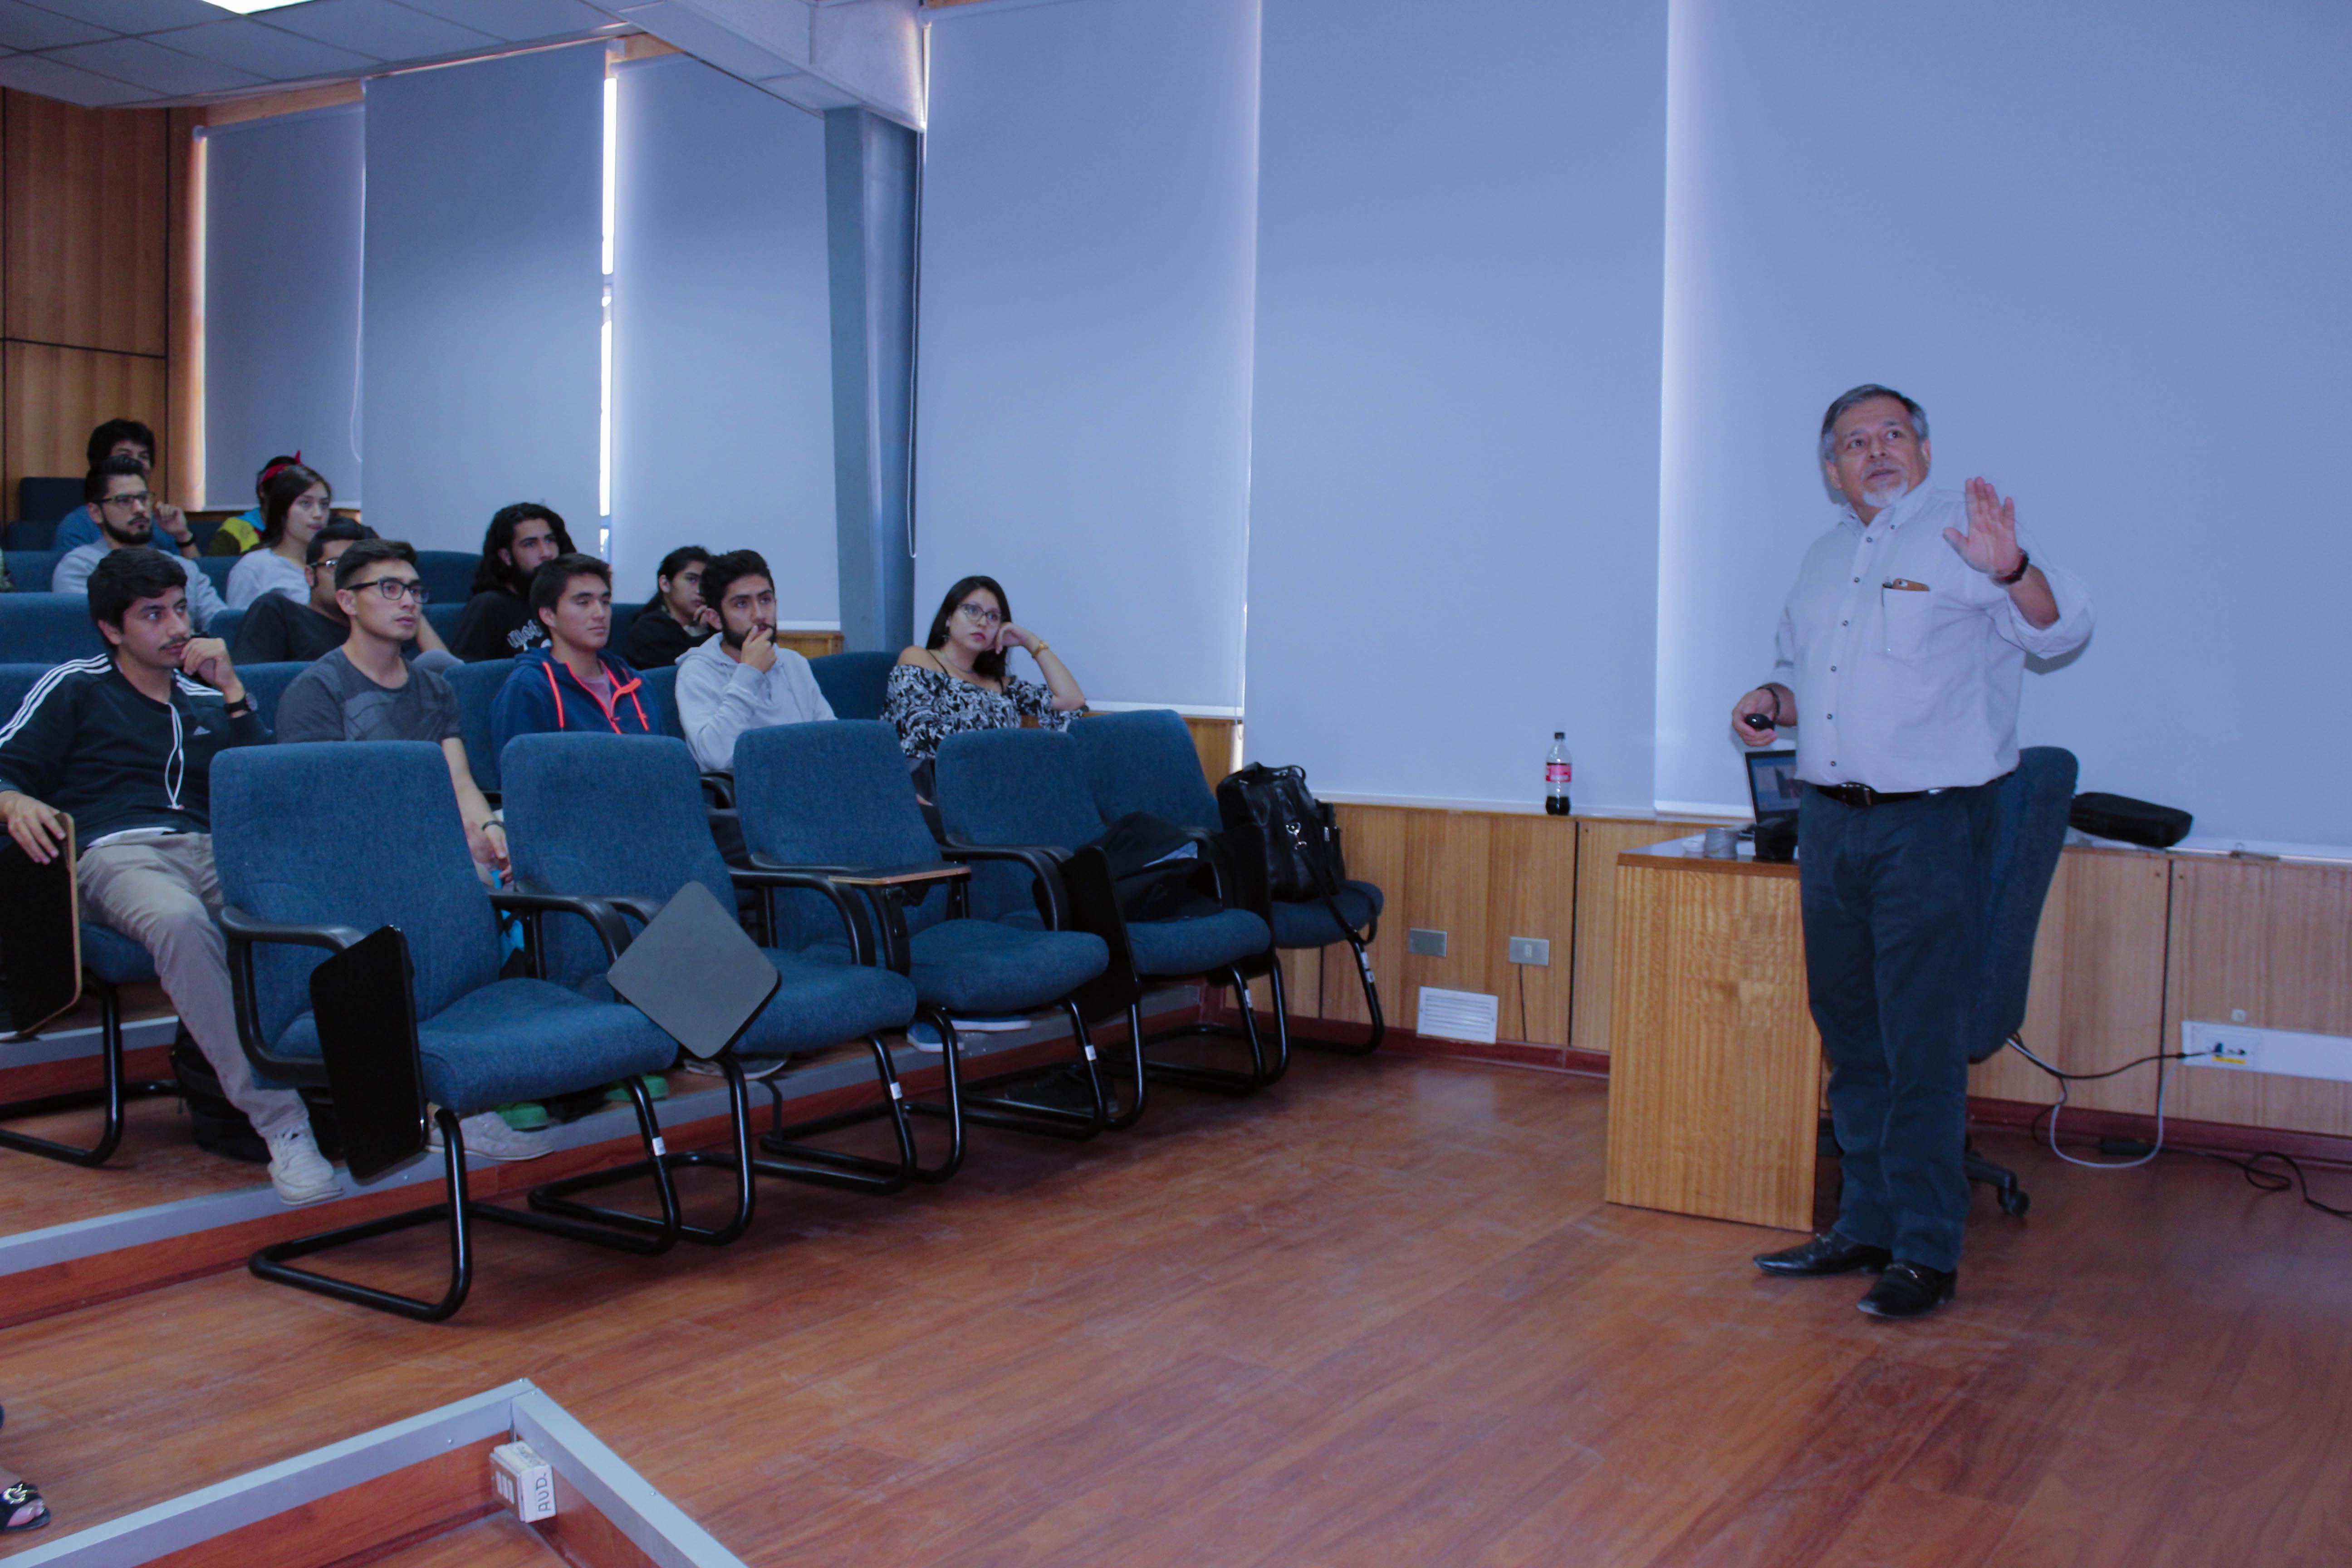 Presentación de Jorge Zamorano